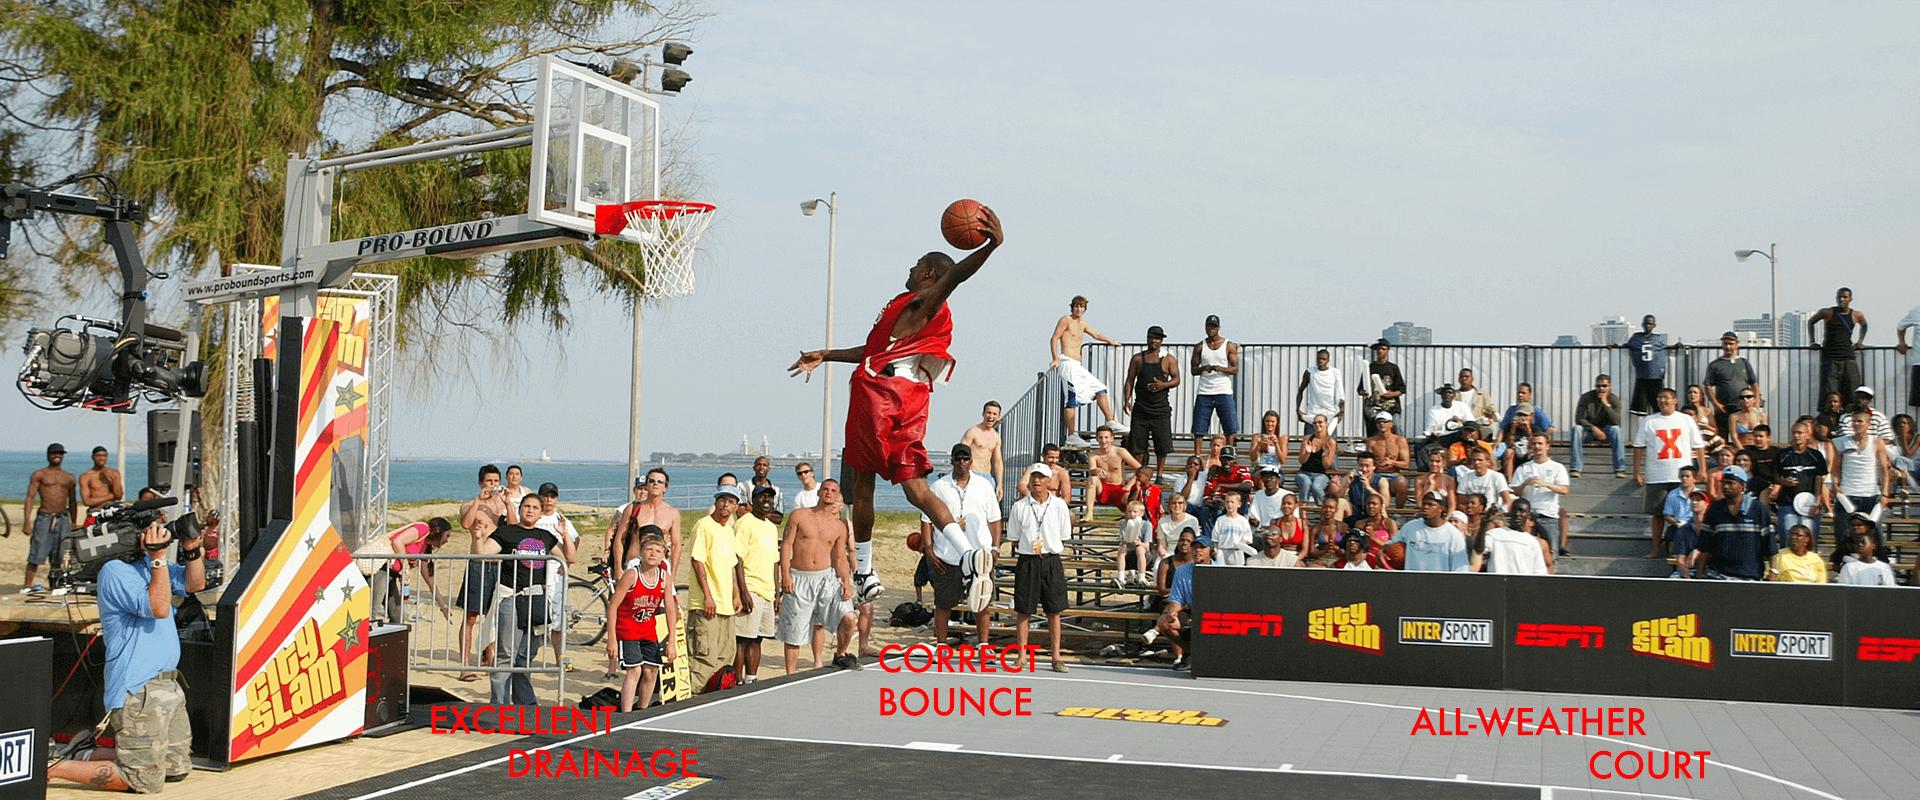 basketball court banner